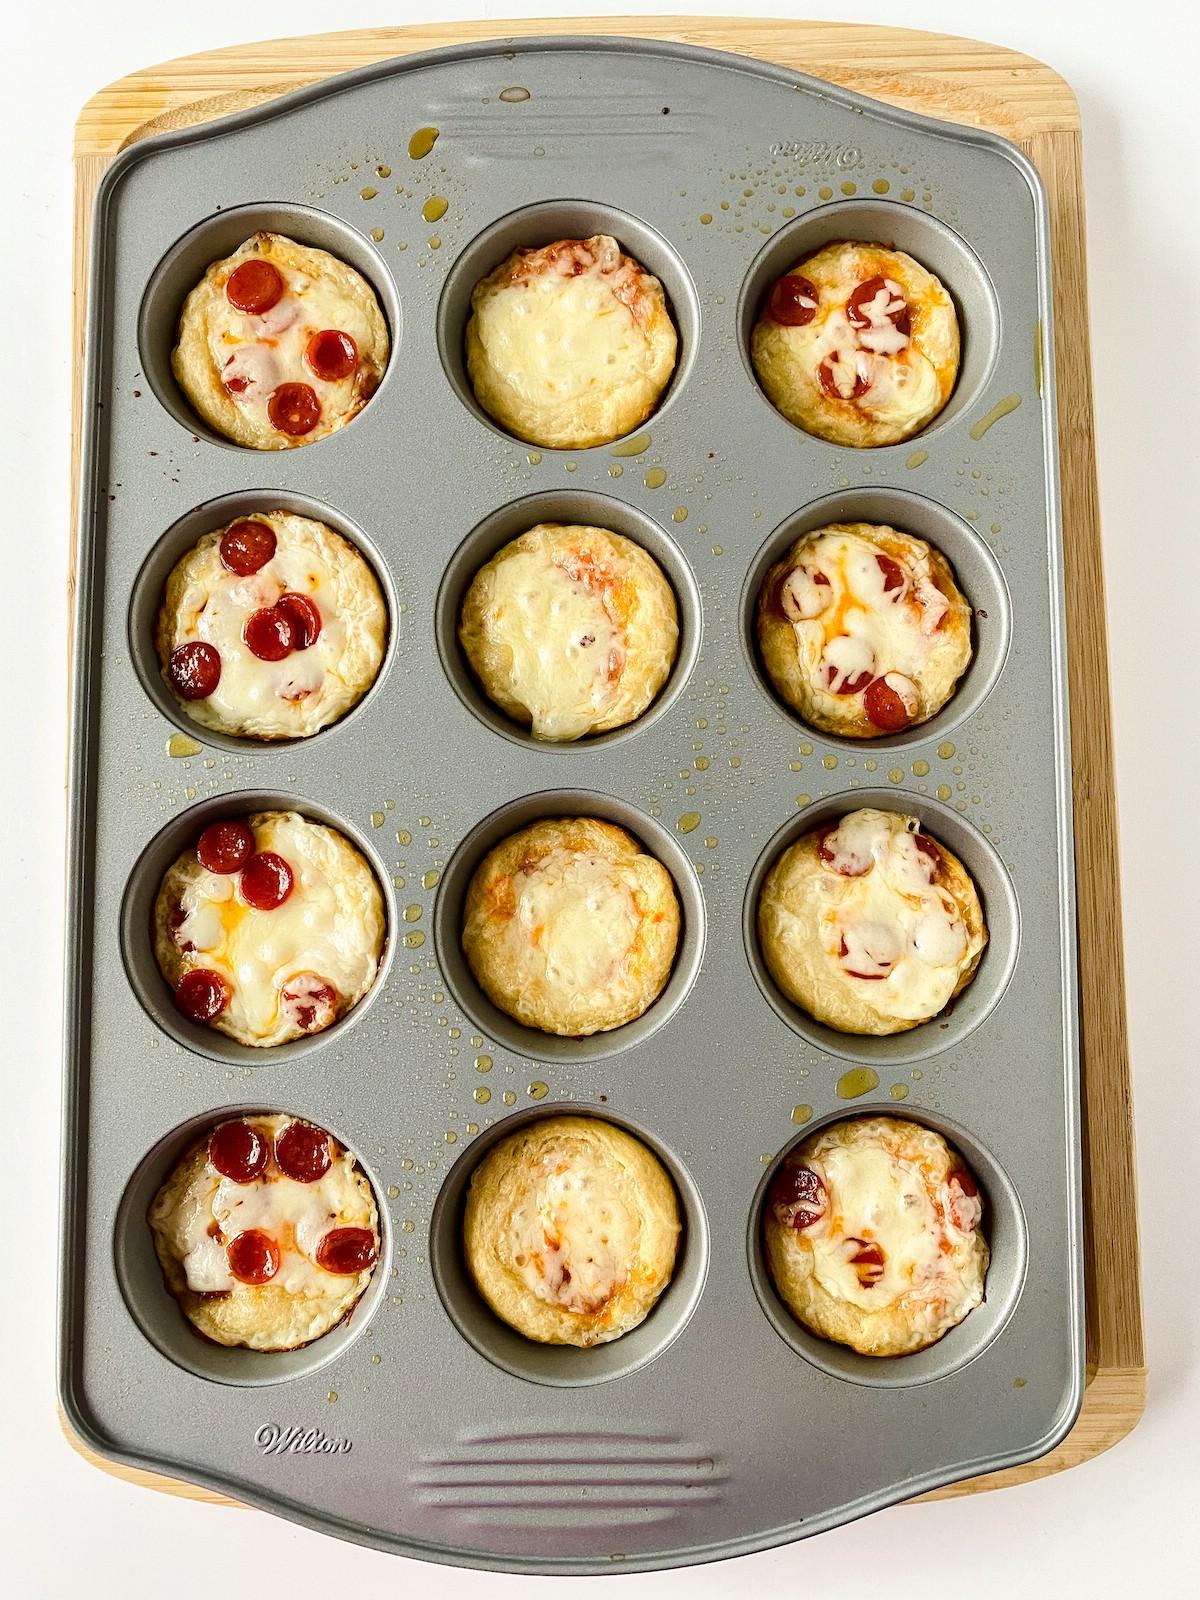 Baked mini deep dish pizzas still in muffin pan